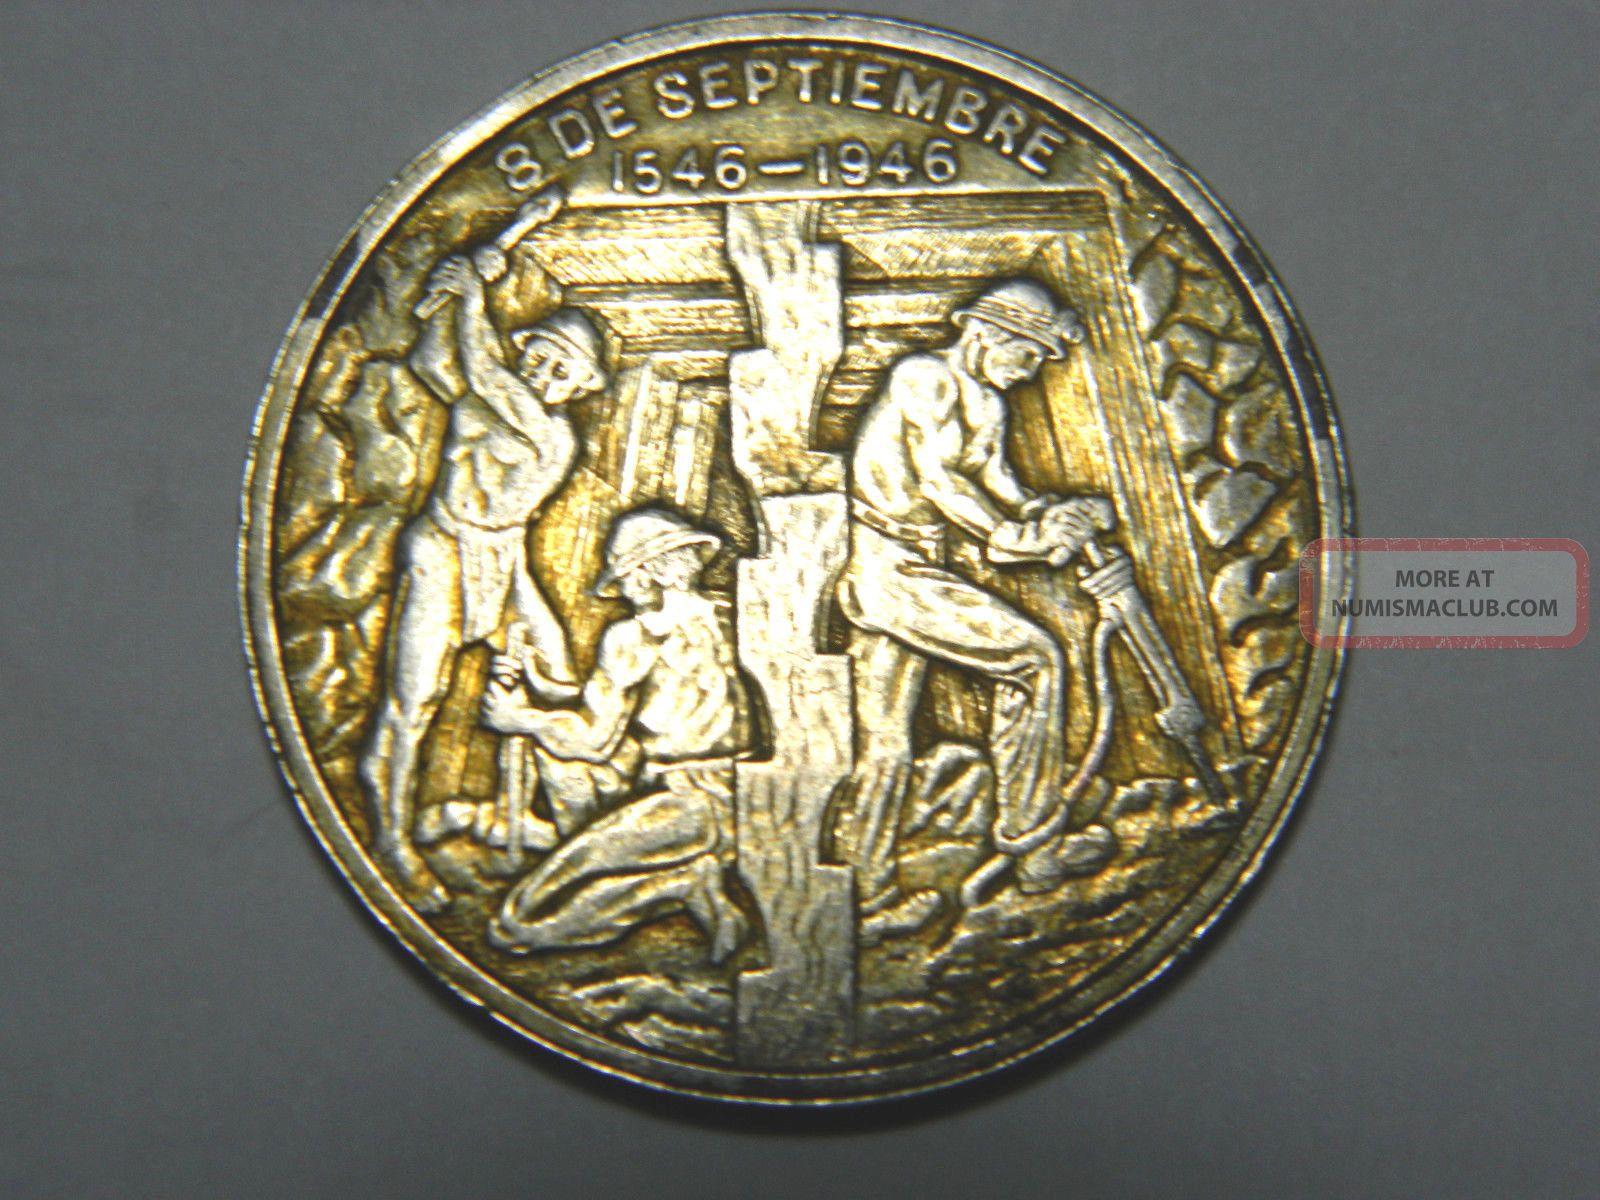 Scarce,  Mexico,  Zacatecas,  1946.  400th Anniversary Silver Medal,  37mm.  Toned Exonumia photo